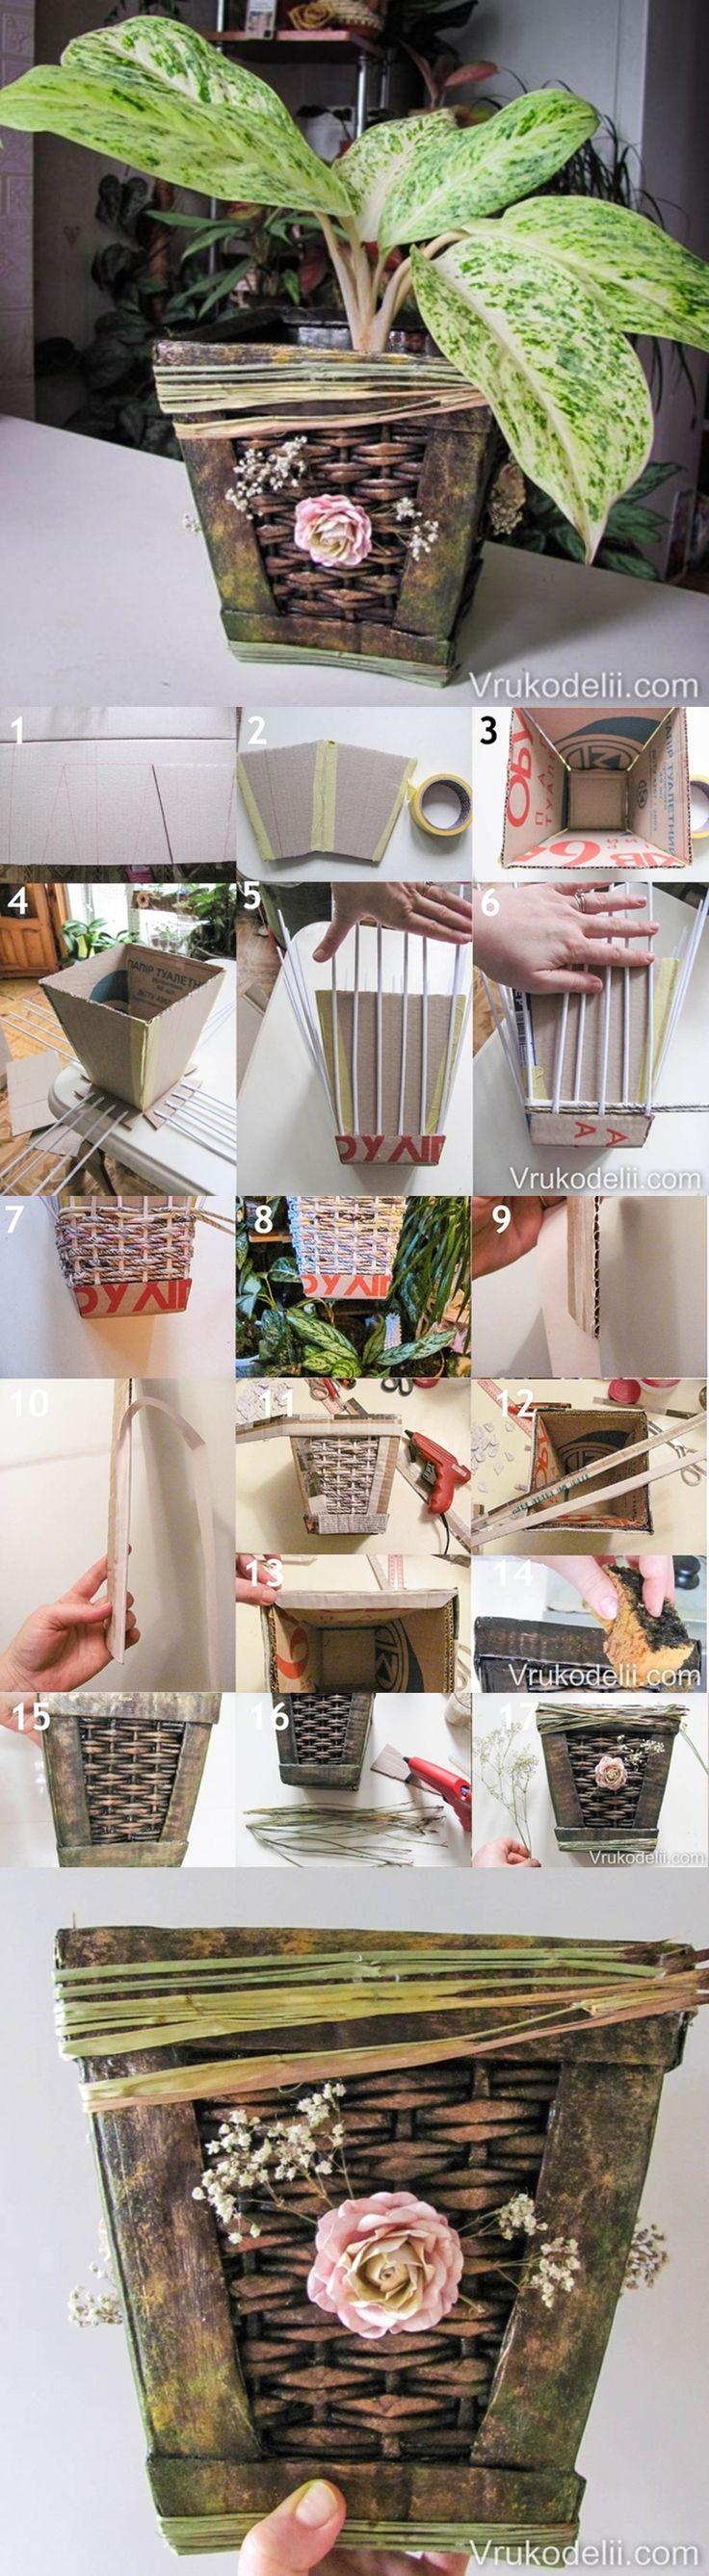 DIY Retro Paper Planter from Old Newspaper | www.FabArtDIY.com LIKE Us on Facebook ==> https://www.facebook.com/FabArtDIY